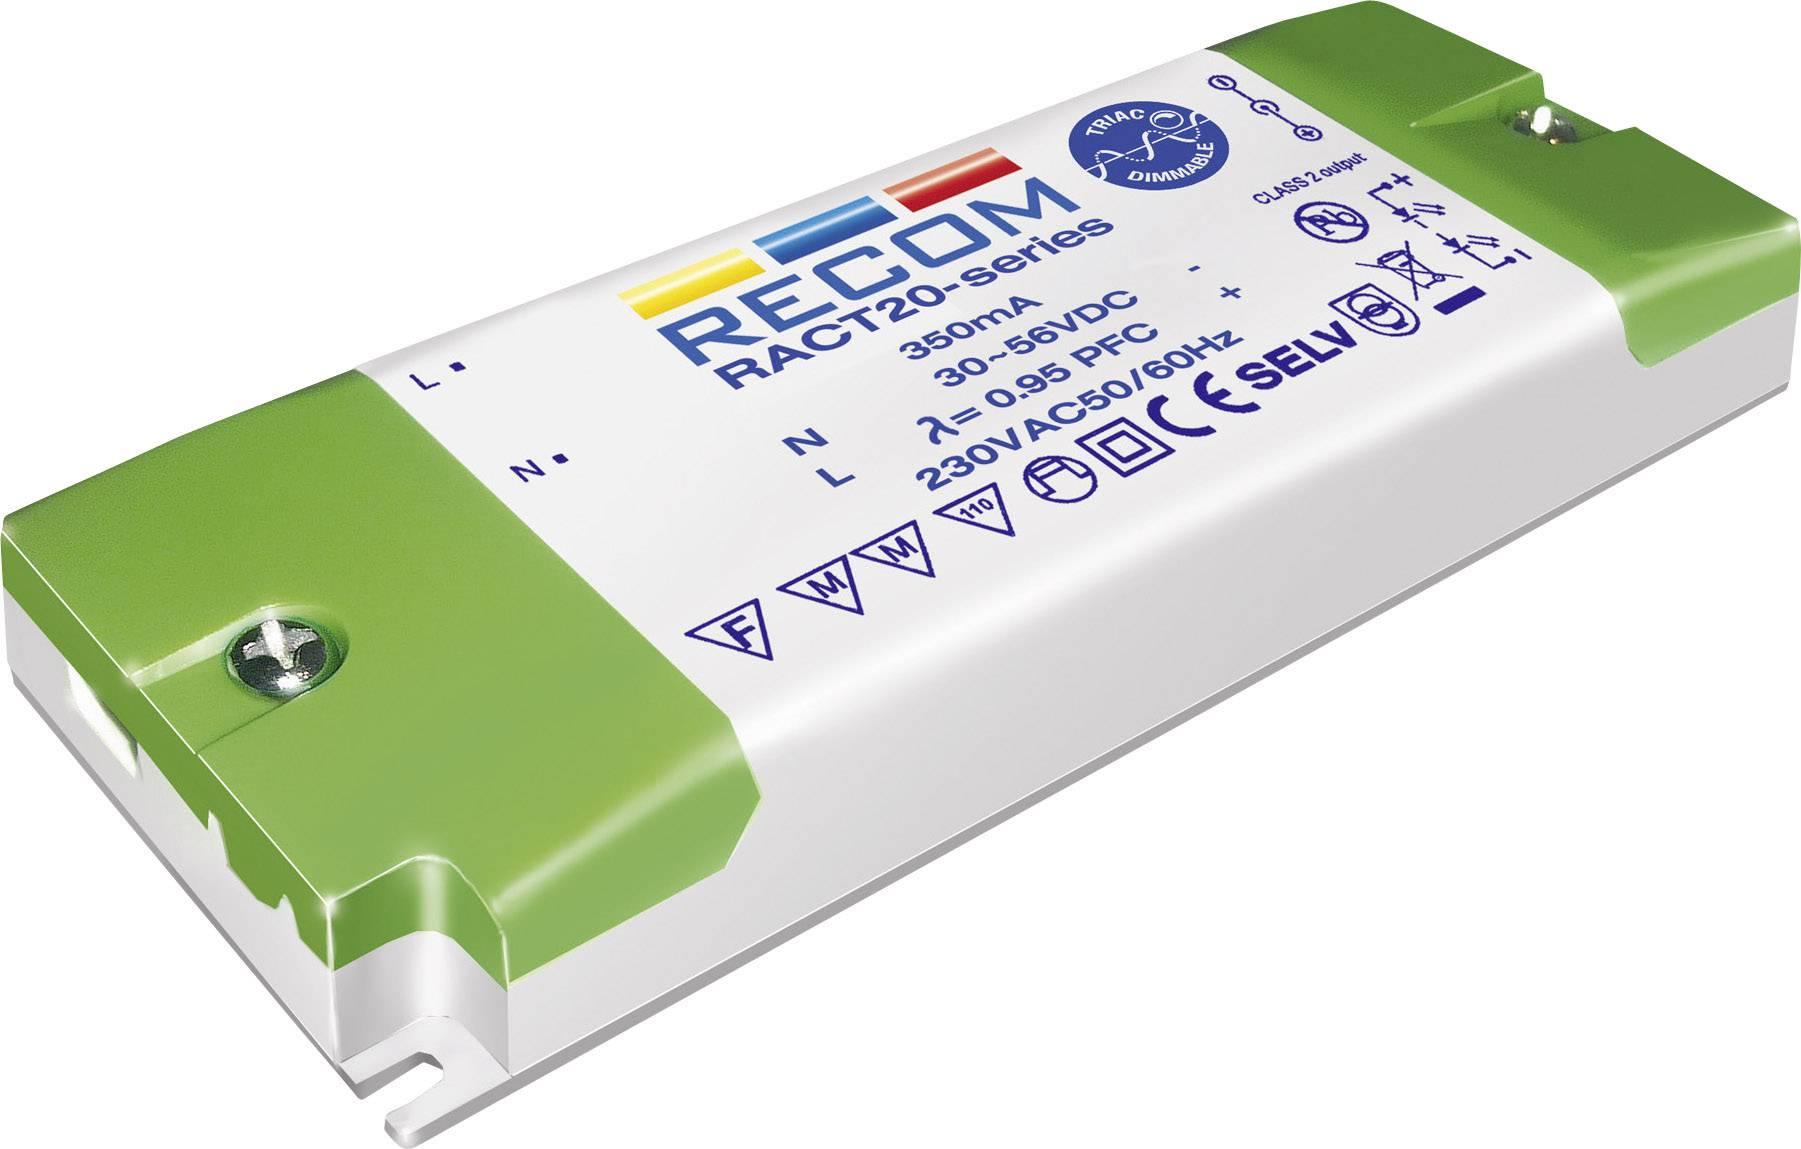 LED driver Recom Lighting RACT20-700, 20 W (max), 0.7 A, 15 - 28 V/DC